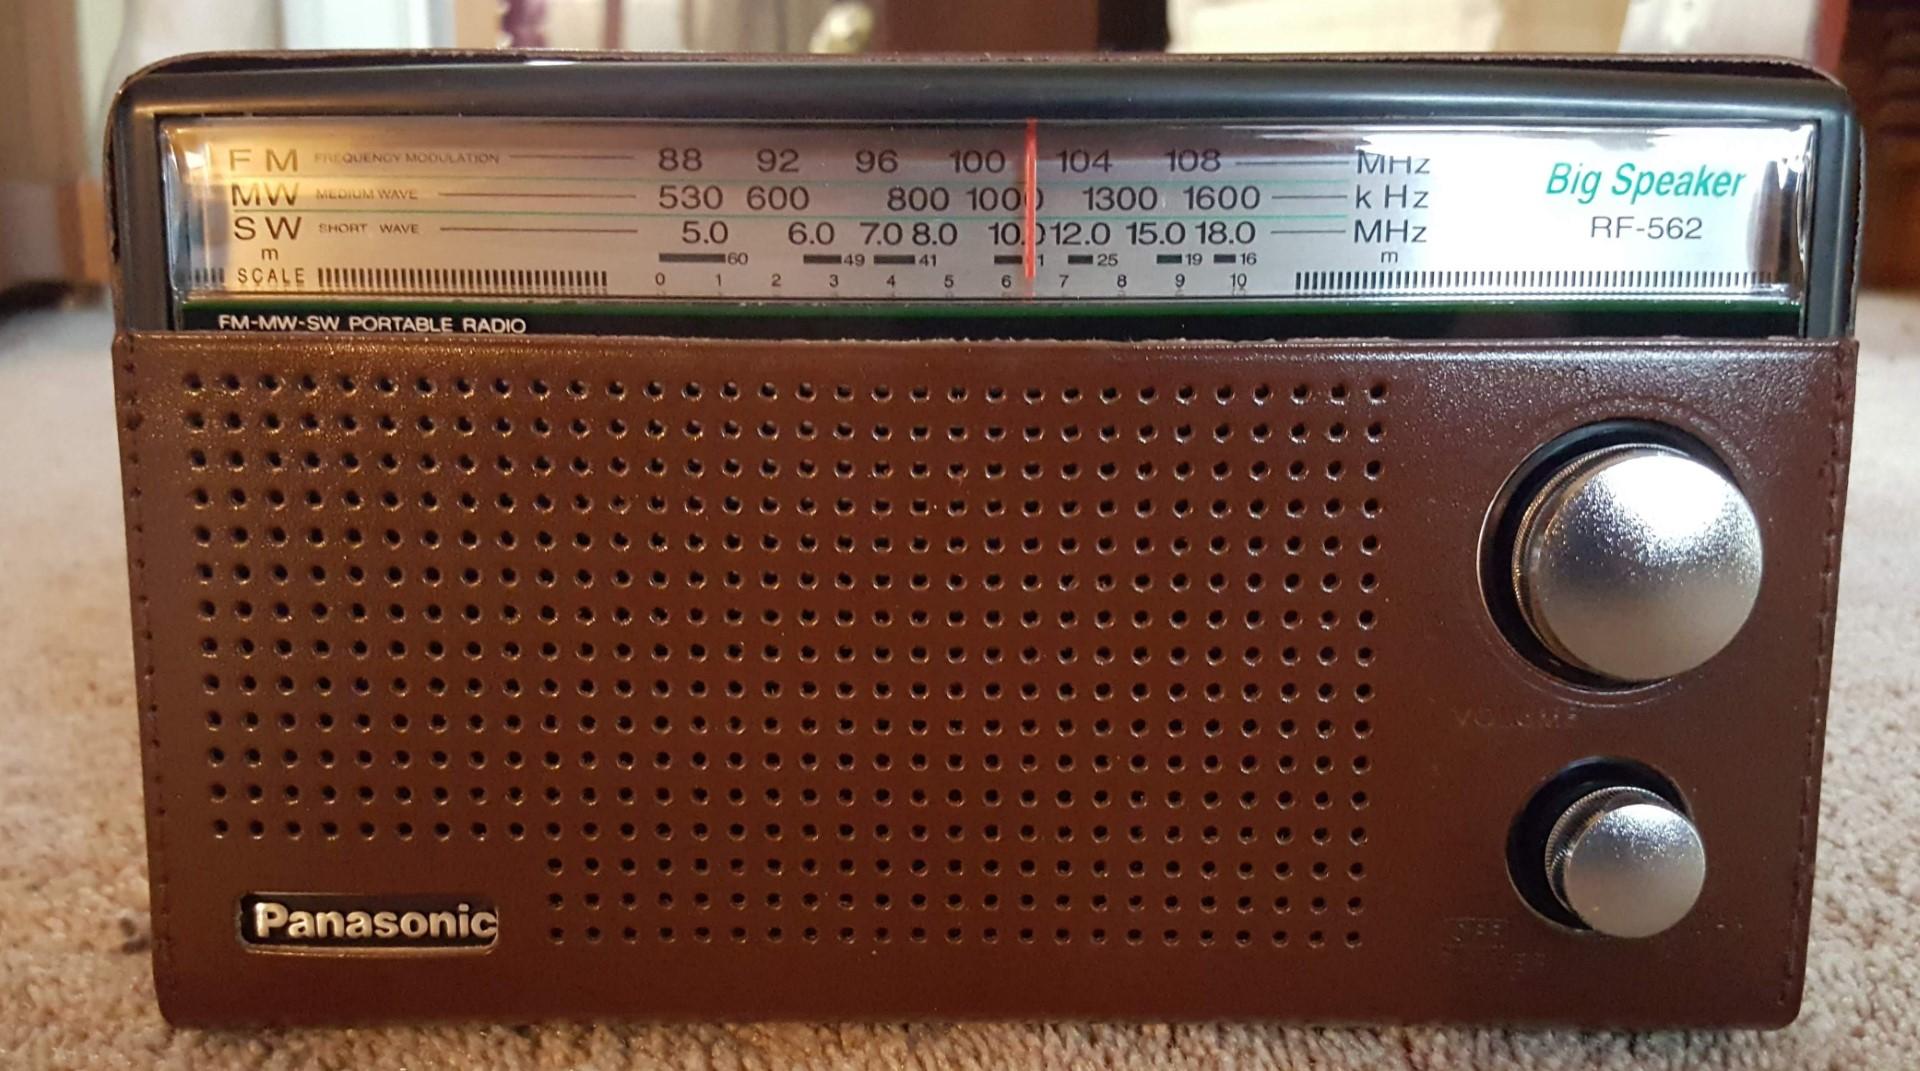 Panasonic RF-562D Retro Design AM-FM-SW Portable Radio | radiojayallen